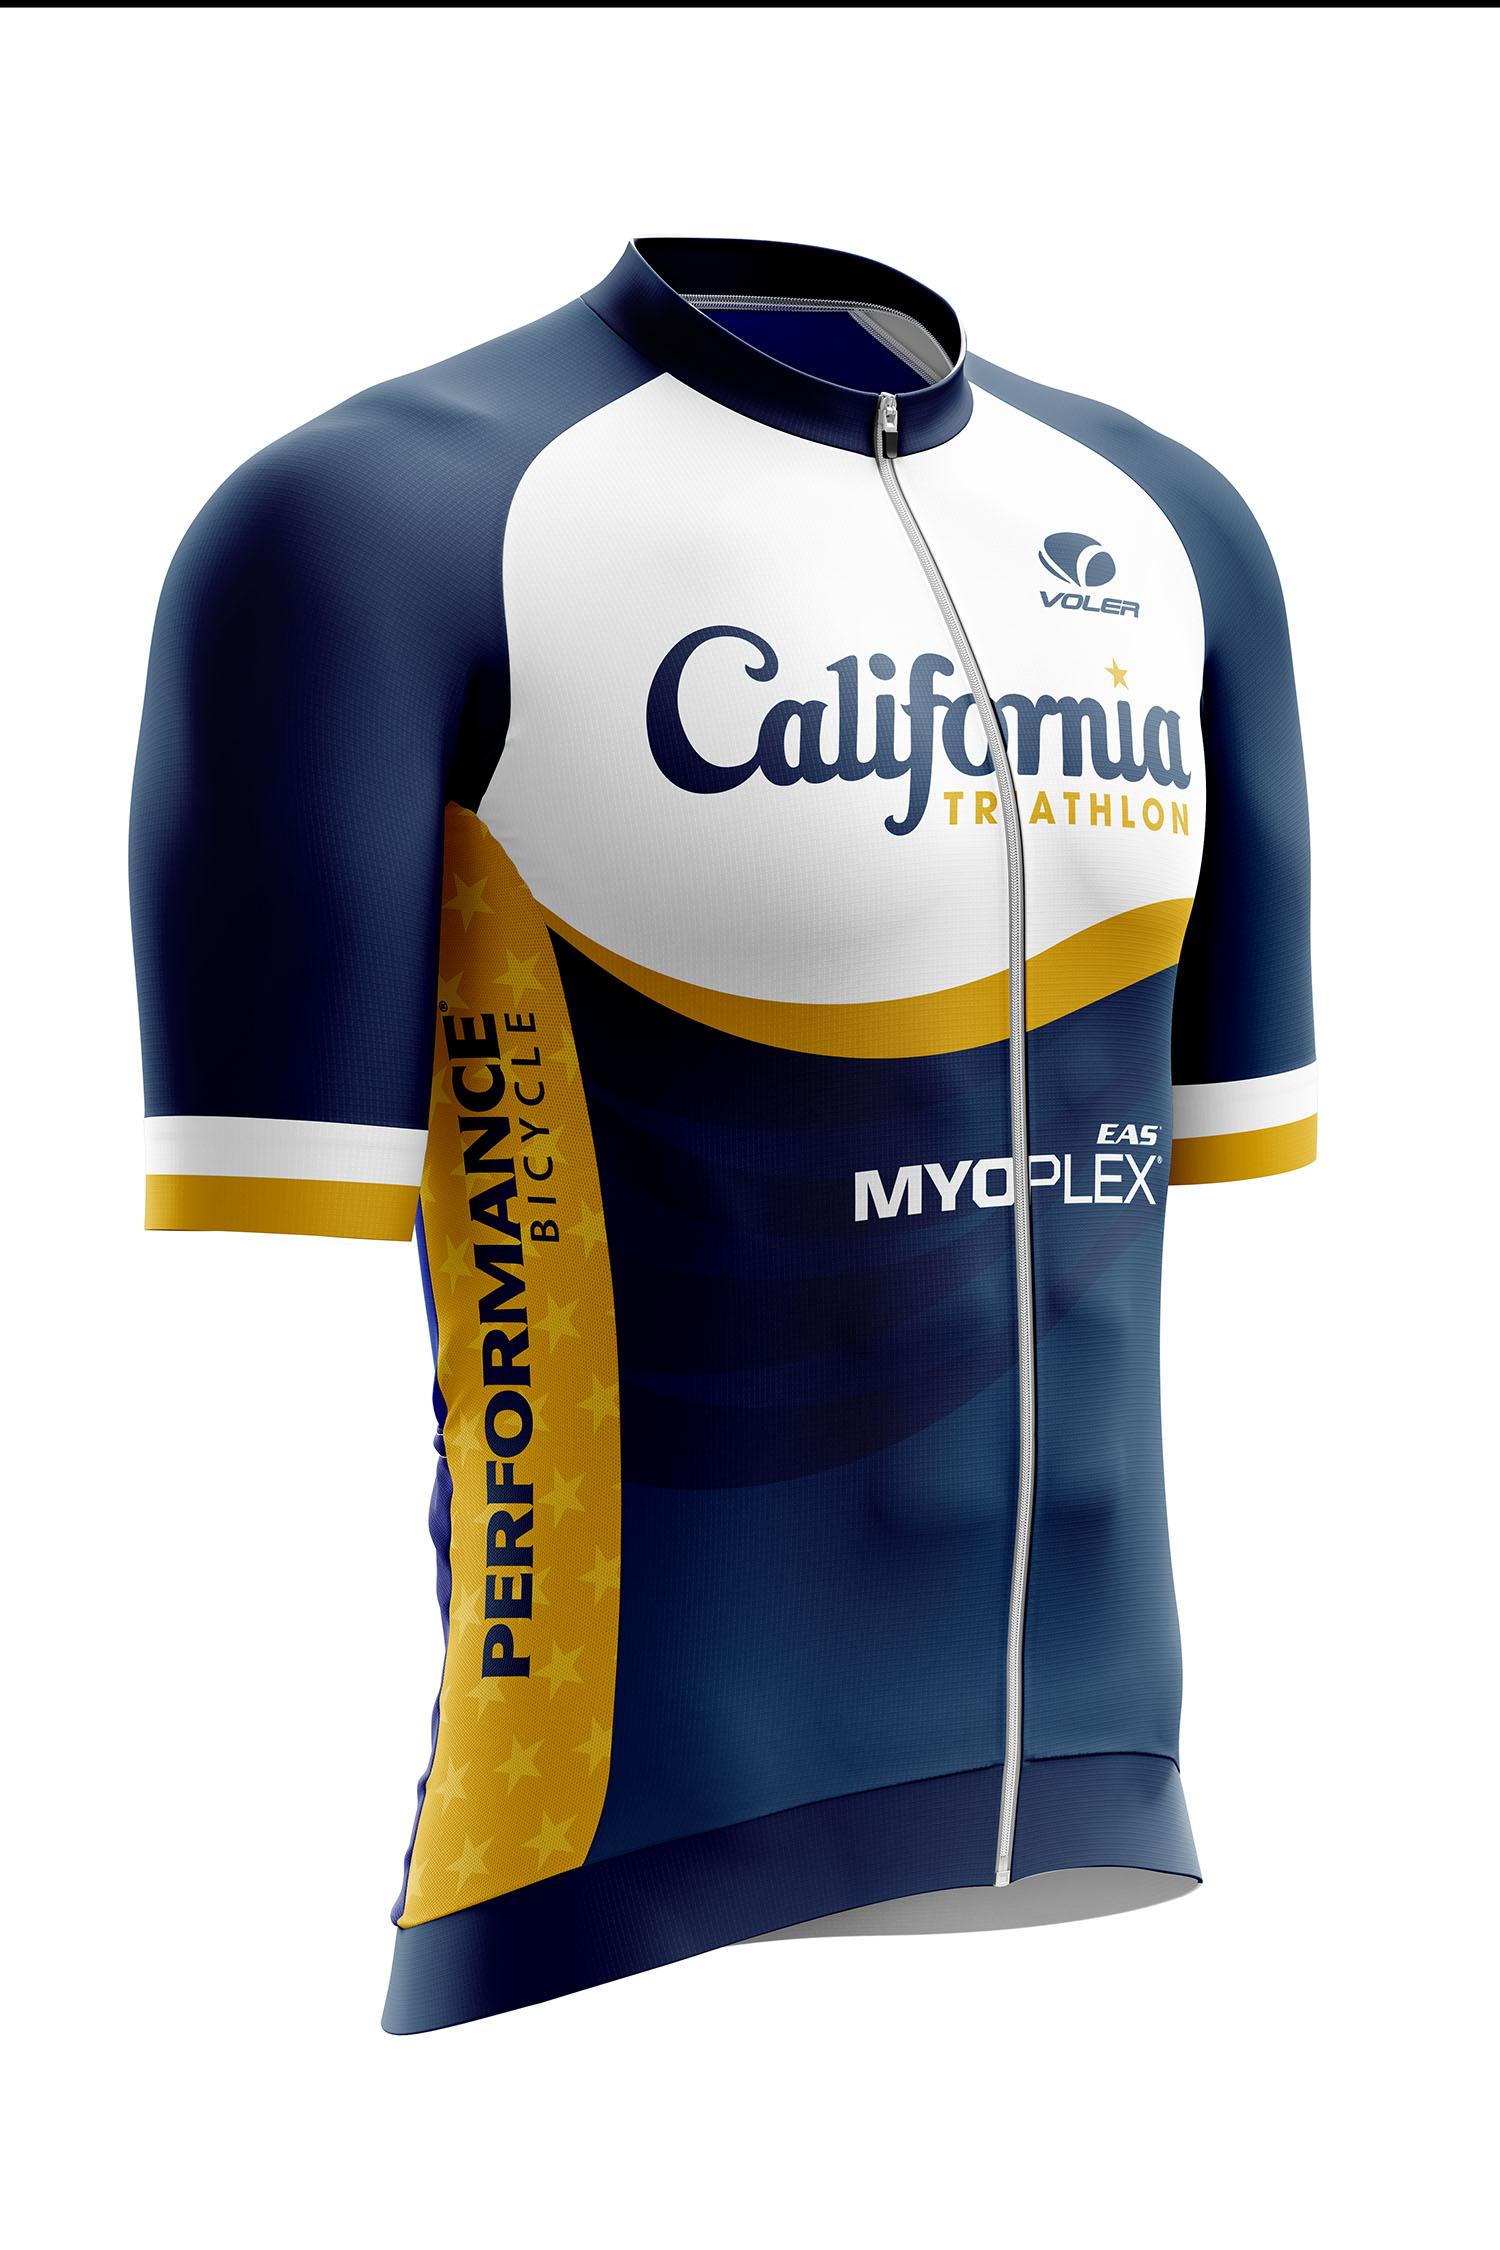 California Triathlon Velocity Jersey Image